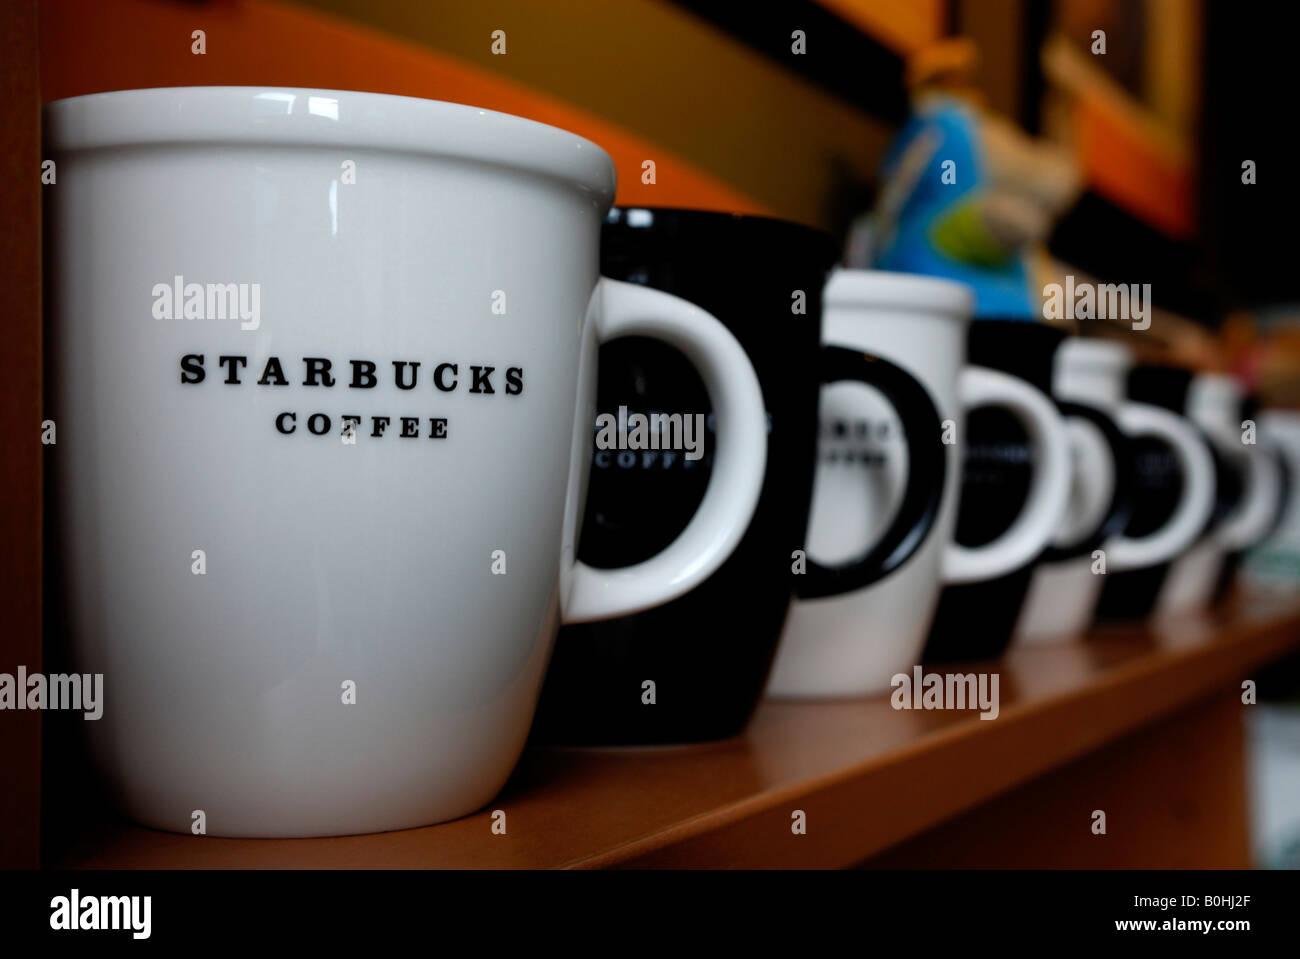 In ShelfStuttgart A Starbucks Row On Coffee And Mugs Black White OXuPZTki